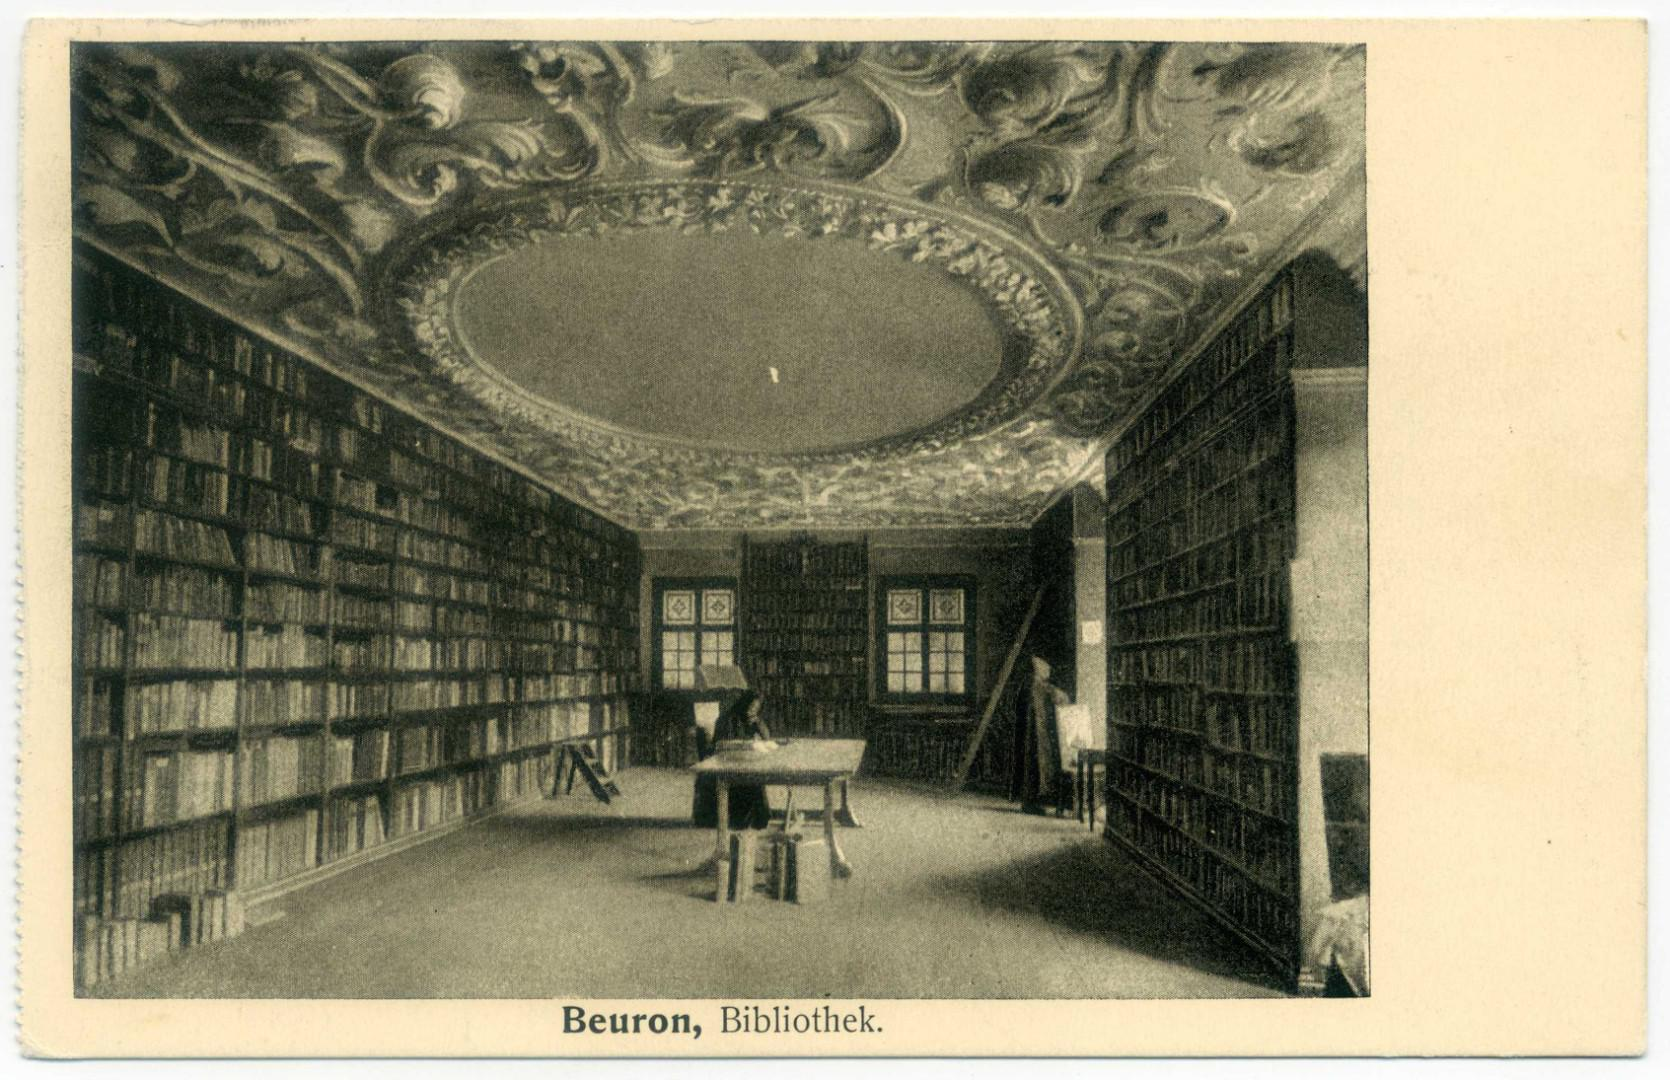 Erzabtei Beuron Bibliothek